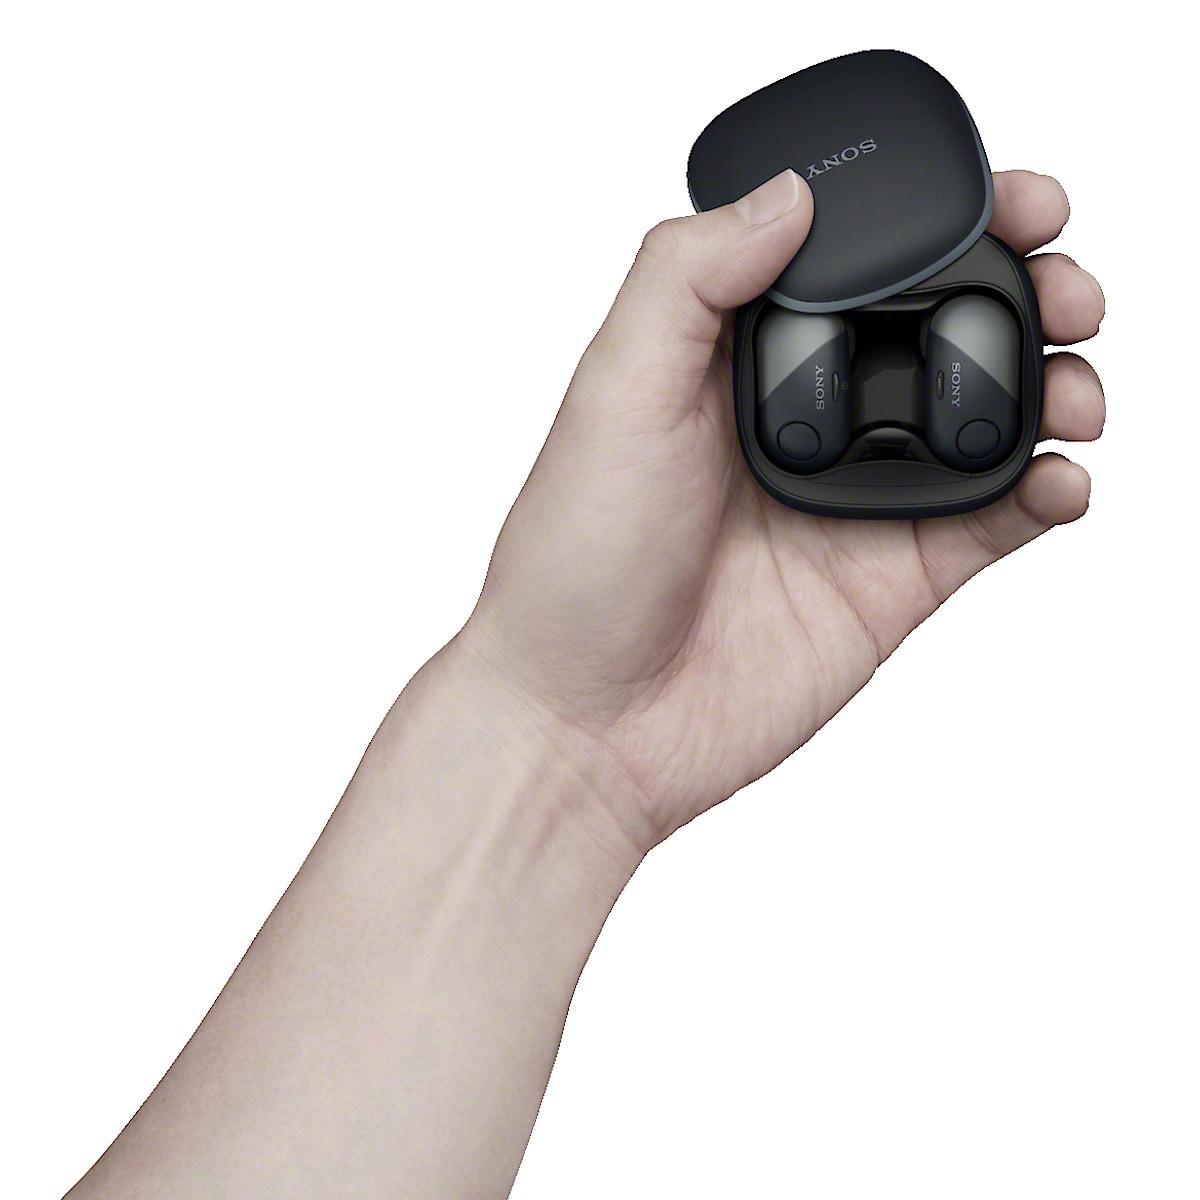 Trådlösa sporthörlurar, Sony WF-SP700N